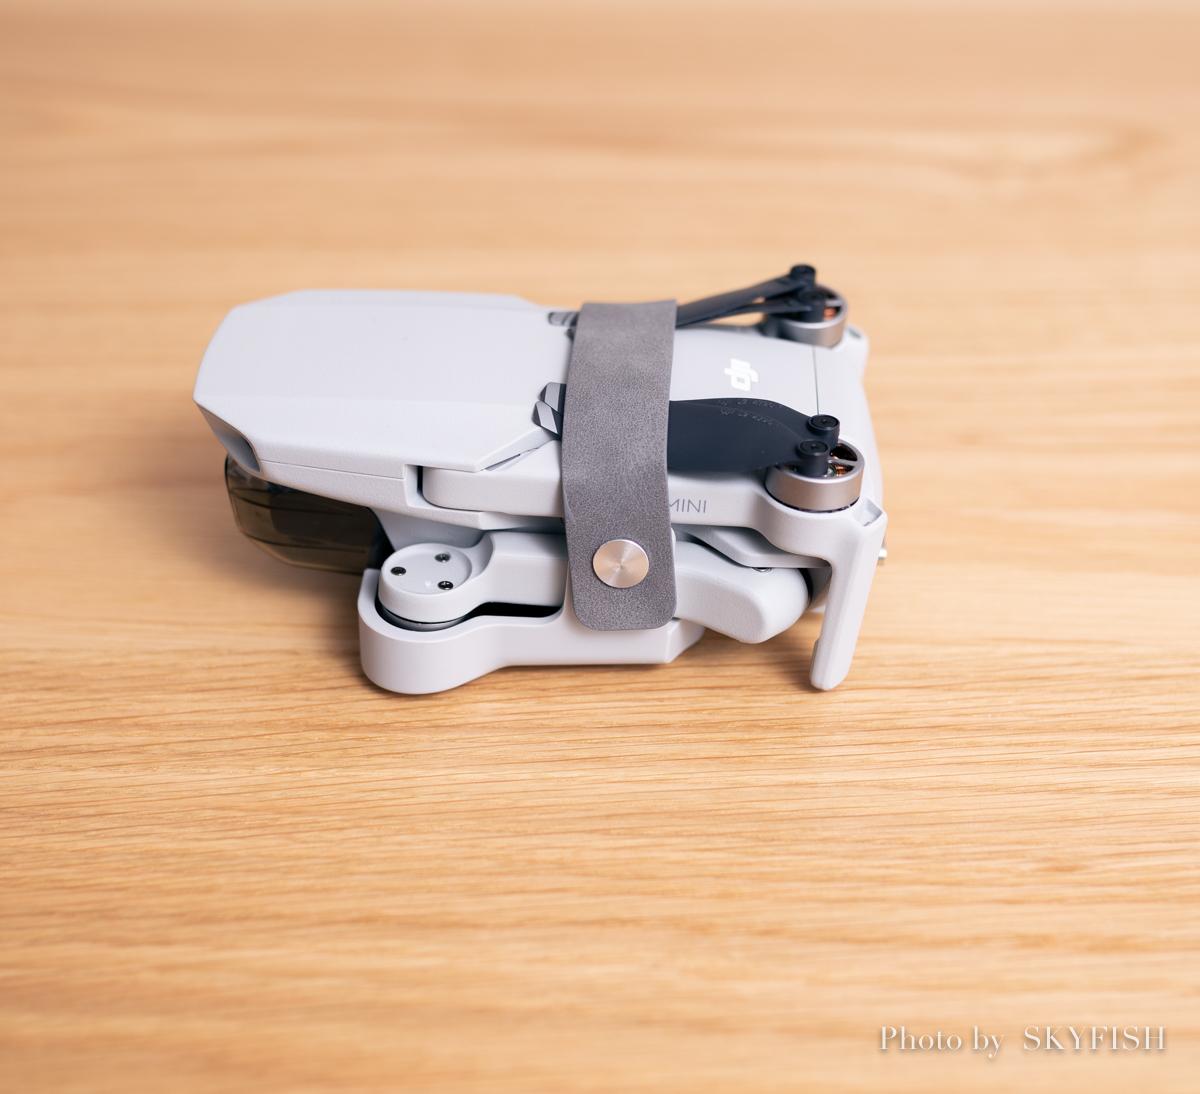 Mavic Mini プロペラホルダー